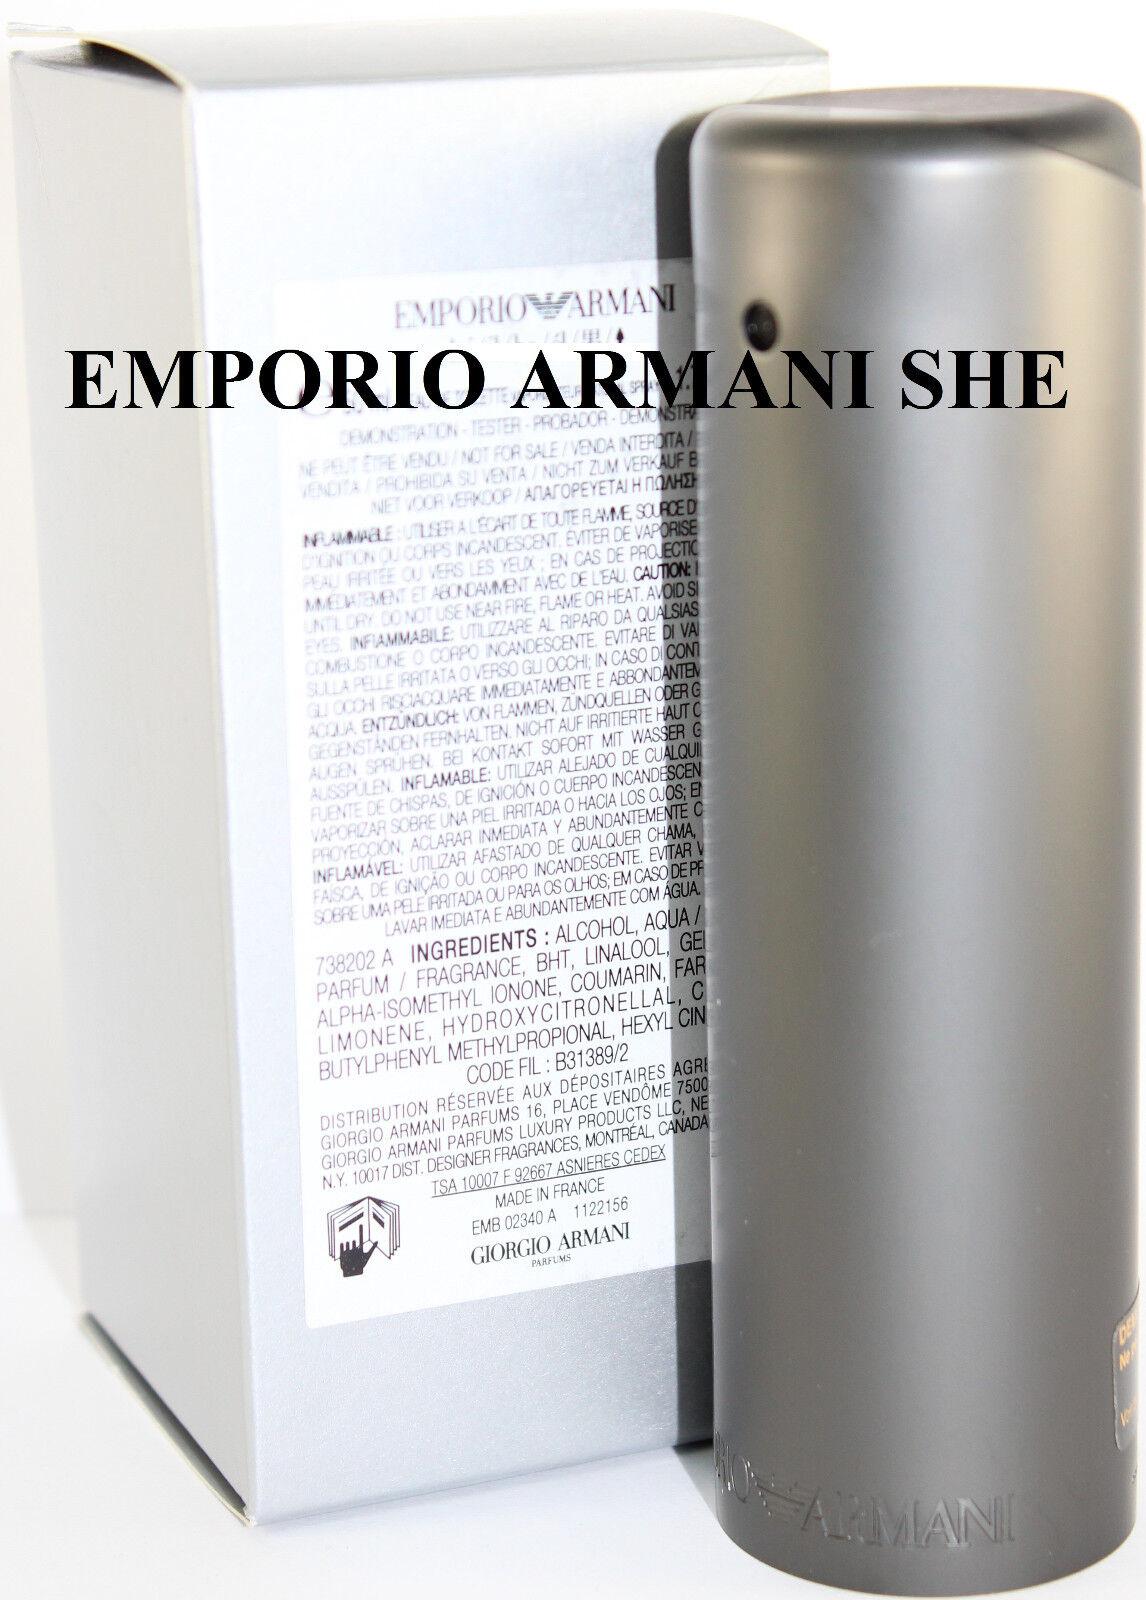 emporio armani she unbox 1 7 1 6 oz edp spray by giorgio. Black Bedroom Furniture Sets. Home Design Ideas